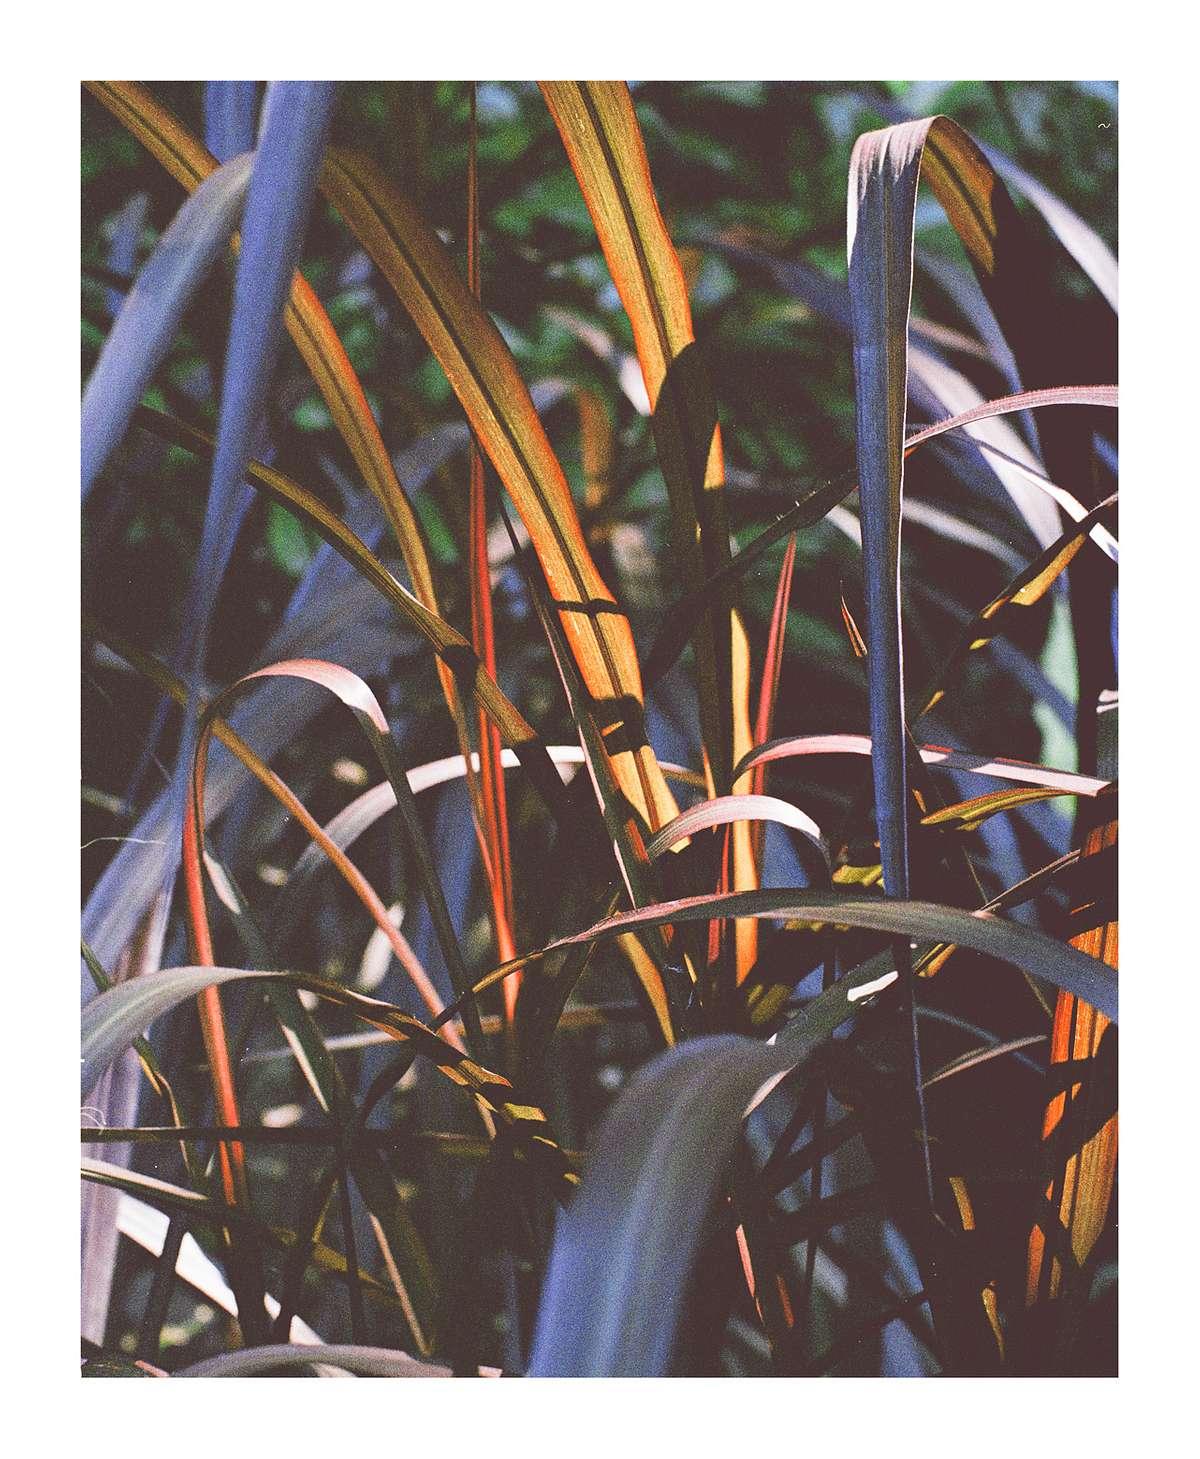 'Brooklyn Botanica 1' - 11.1 x 13.5 inches - £25